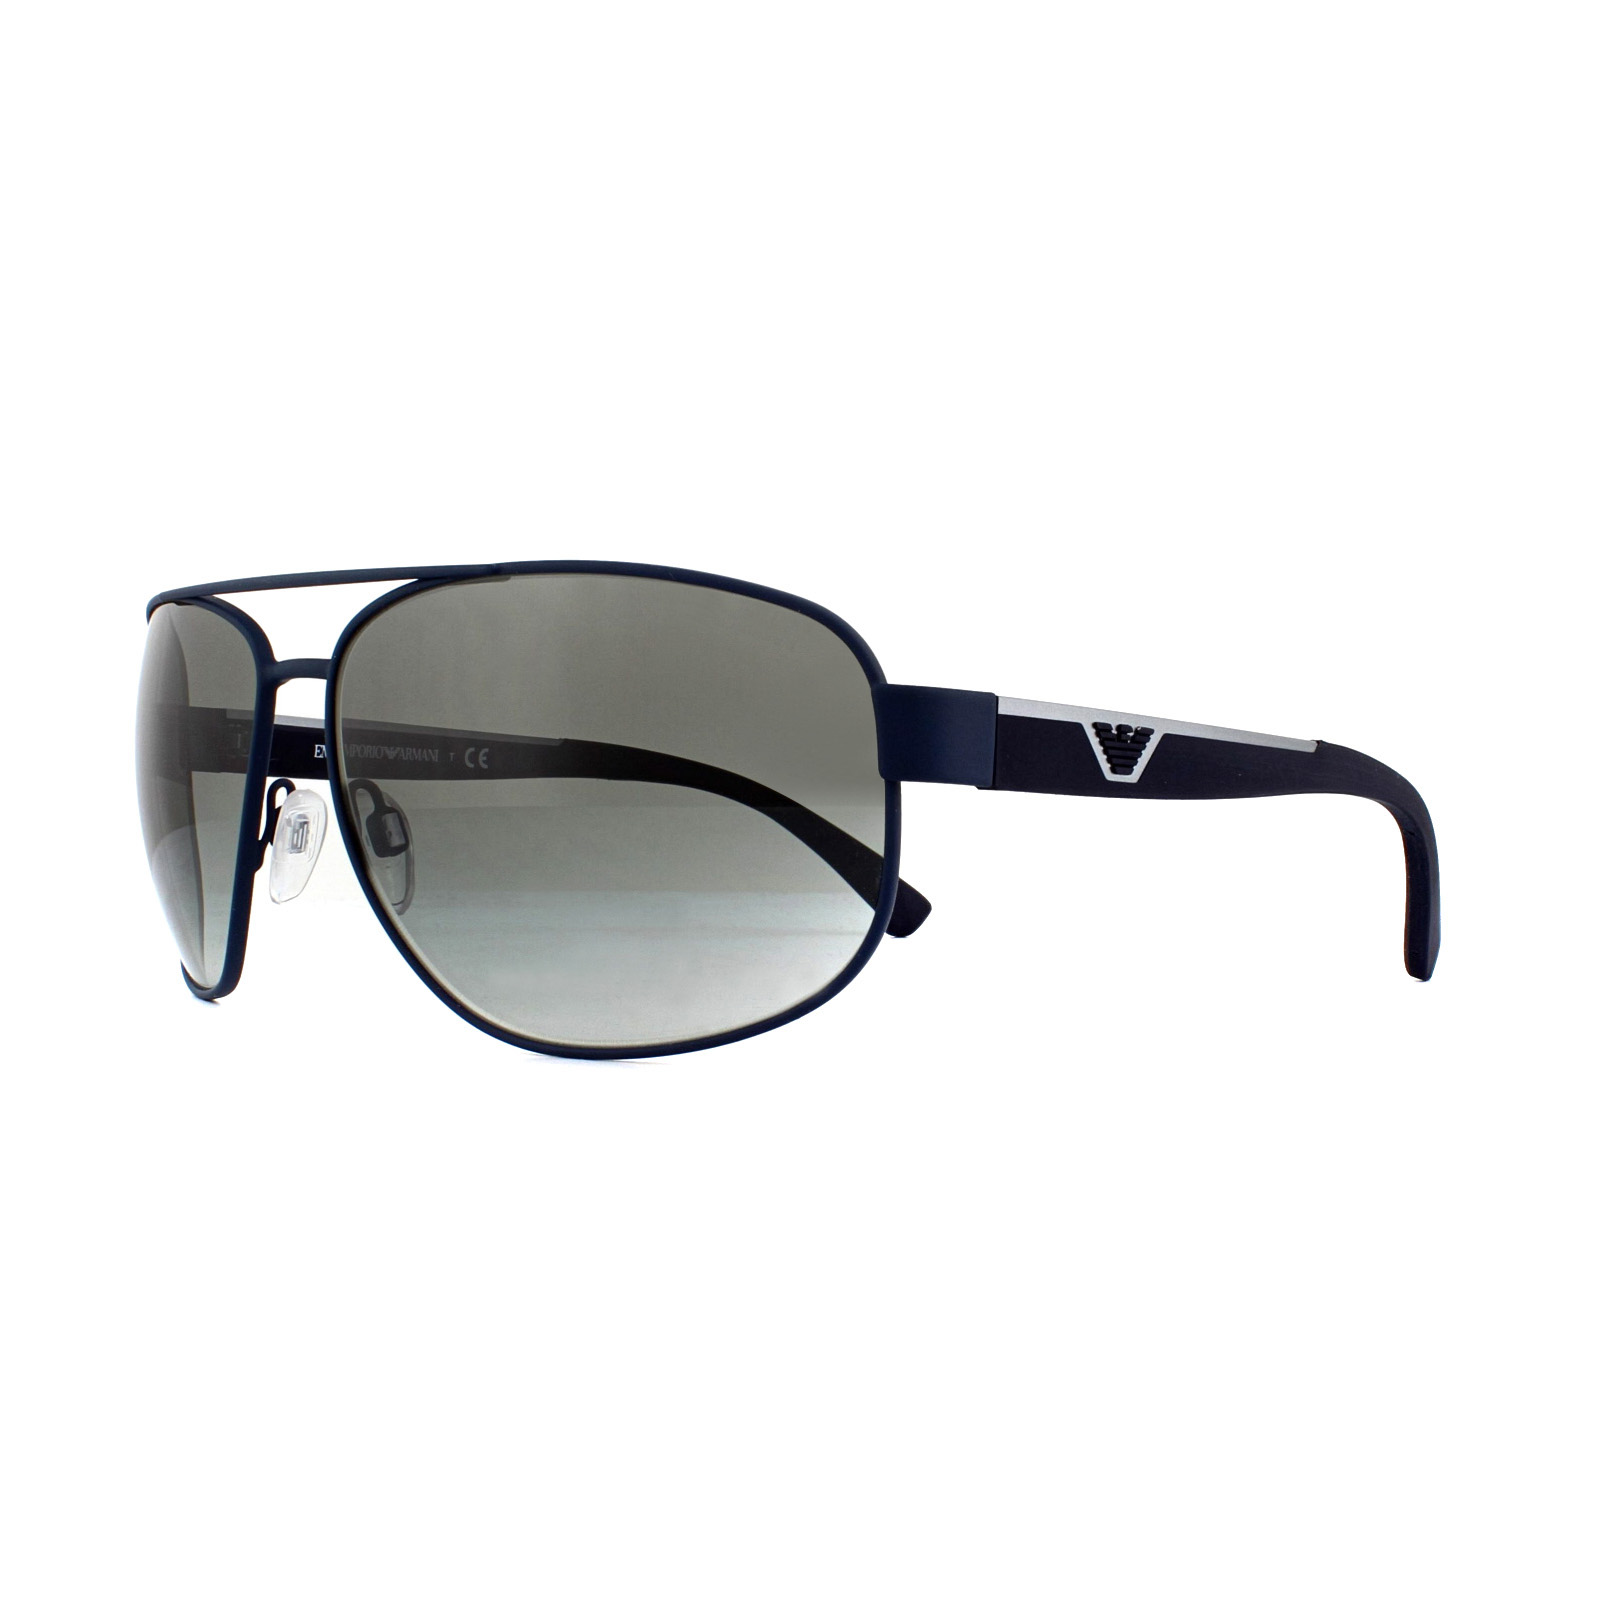 3ce98af9008 Sentinel Emporio Armani Sunglasses EA2036 318811 Dark Blue Rubber Grey  Gradient